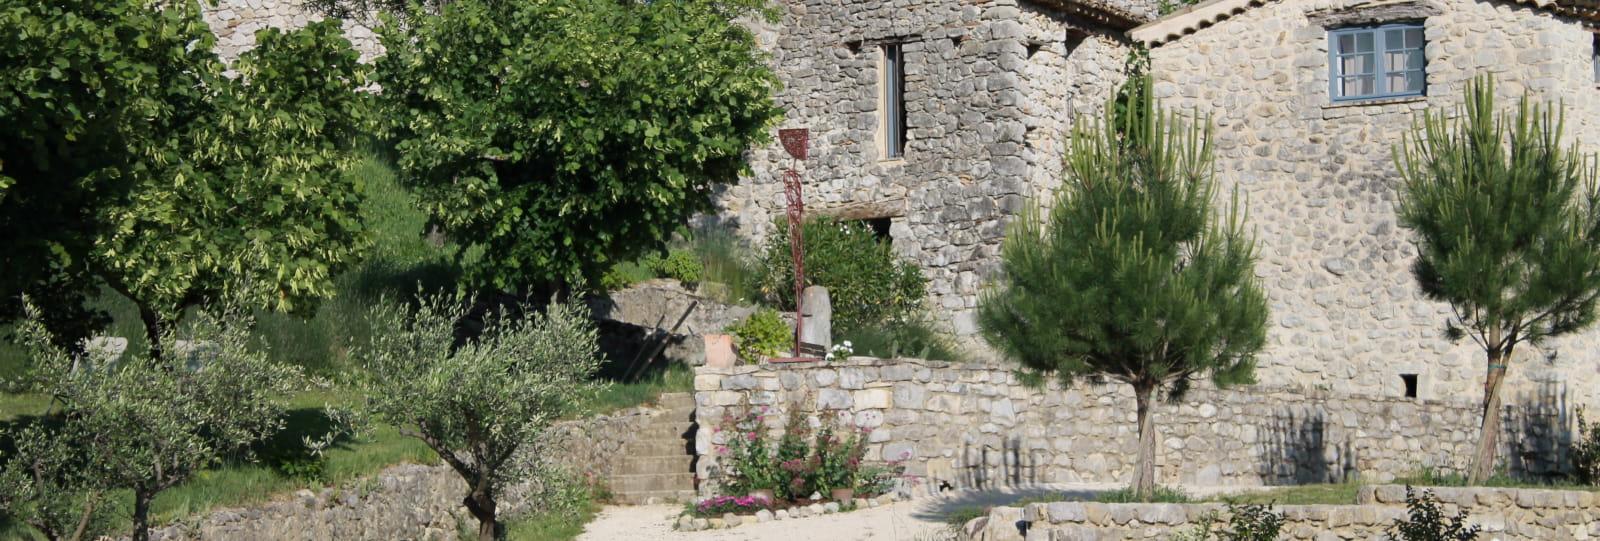 hameau de la savouillane